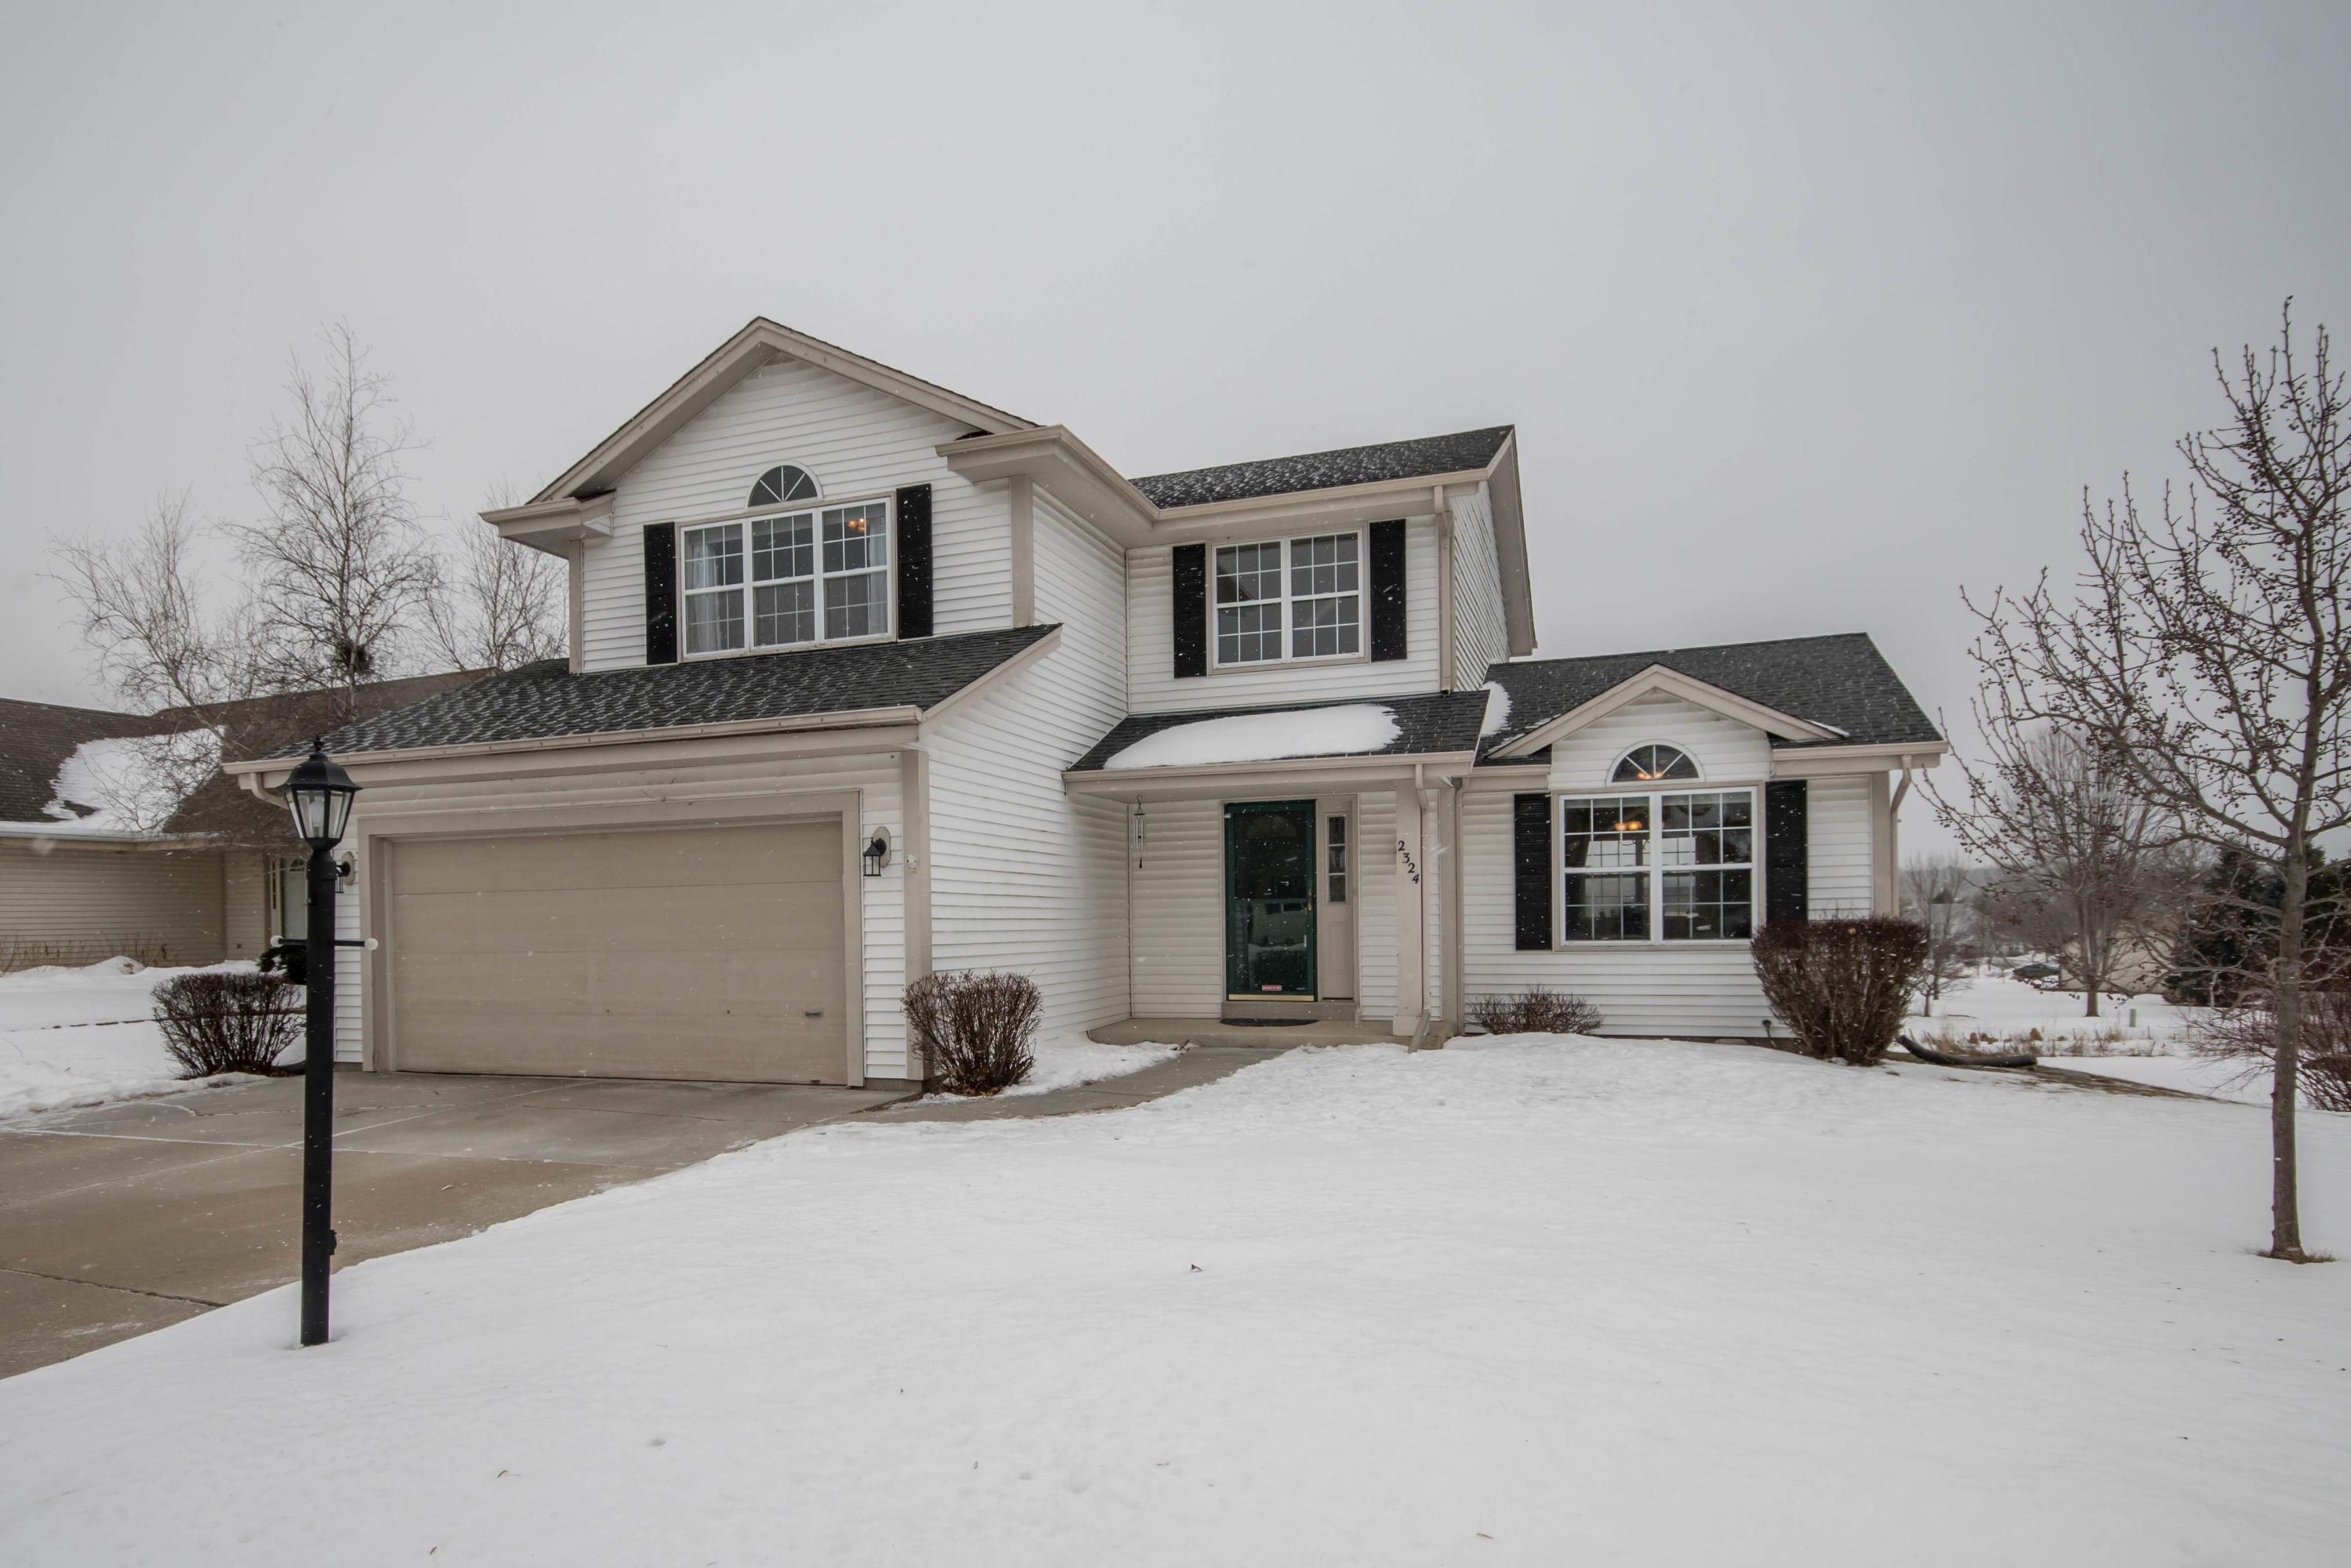 2324 Kestrel Ln, Waukesha, Wisconsin 53189, 4 Bedrooms Bedrooms, 9 Rooms Rooms,3 BathroomsBathrooms,Single-Family,For Sale,Kestrel Ln,1624150